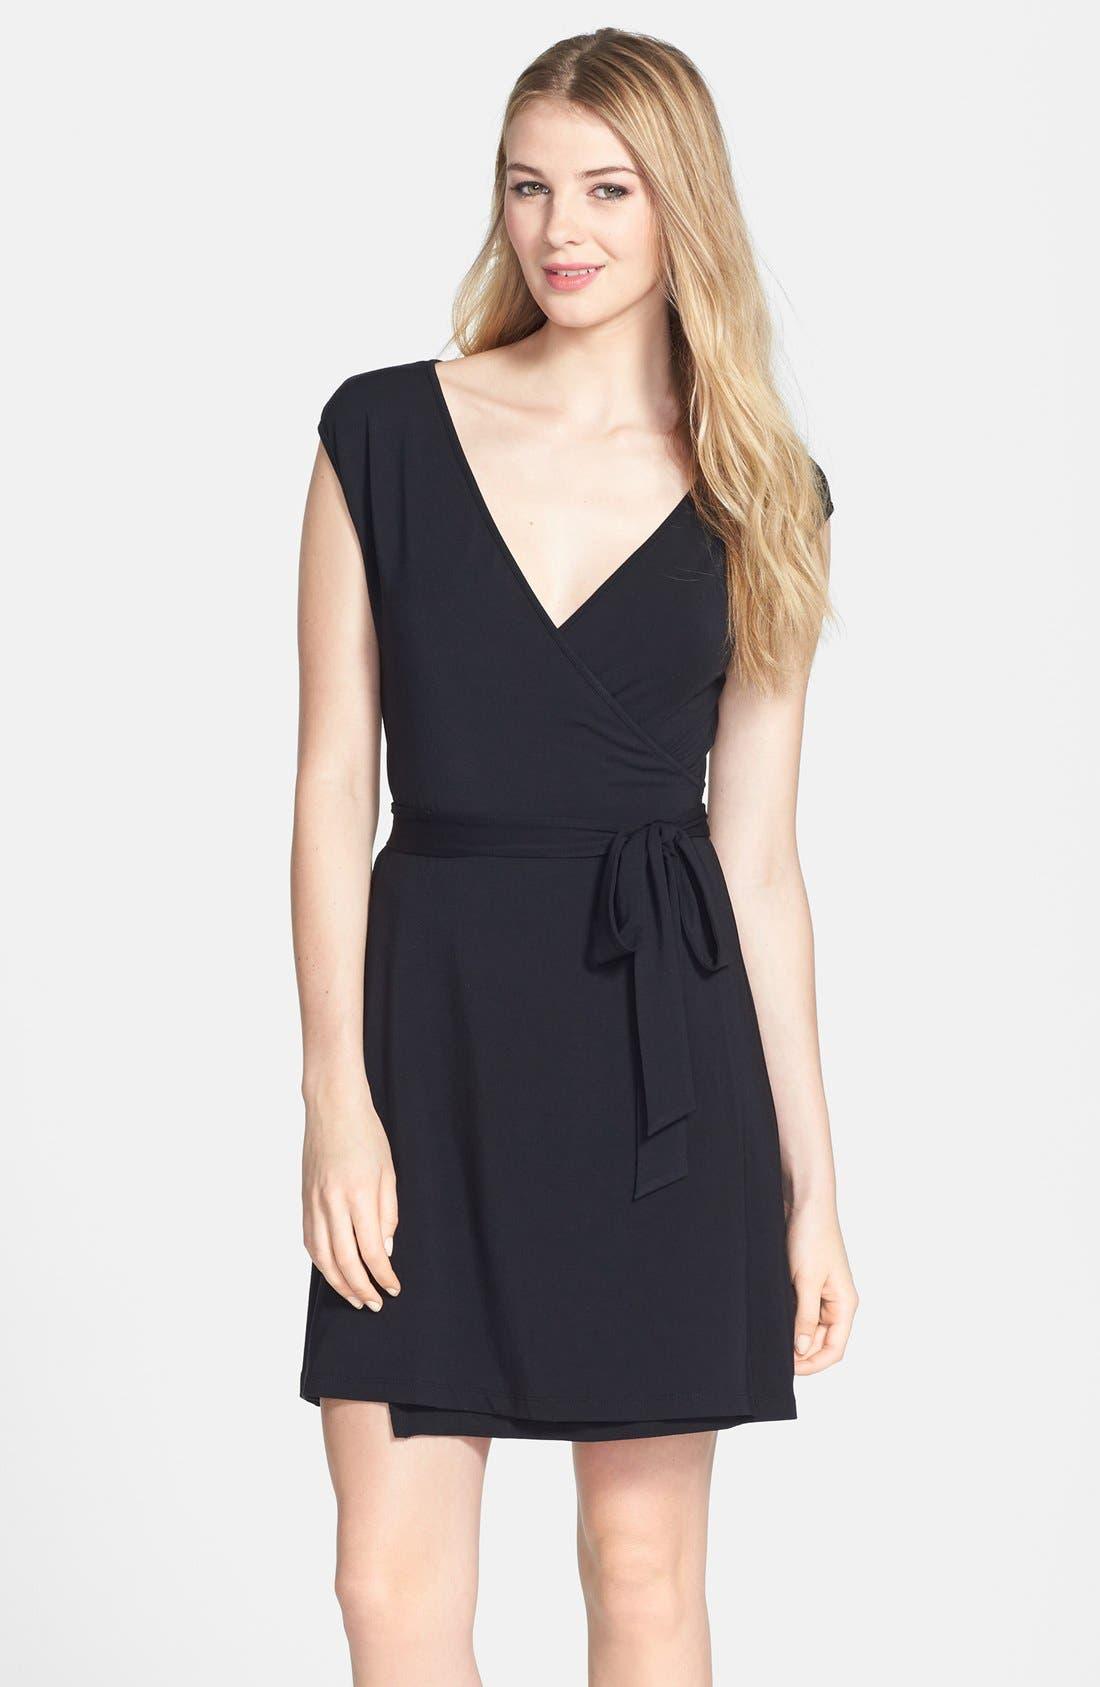 Alternate Image 1 Selected - Tart 'Rina' Reversible Wrap Dress